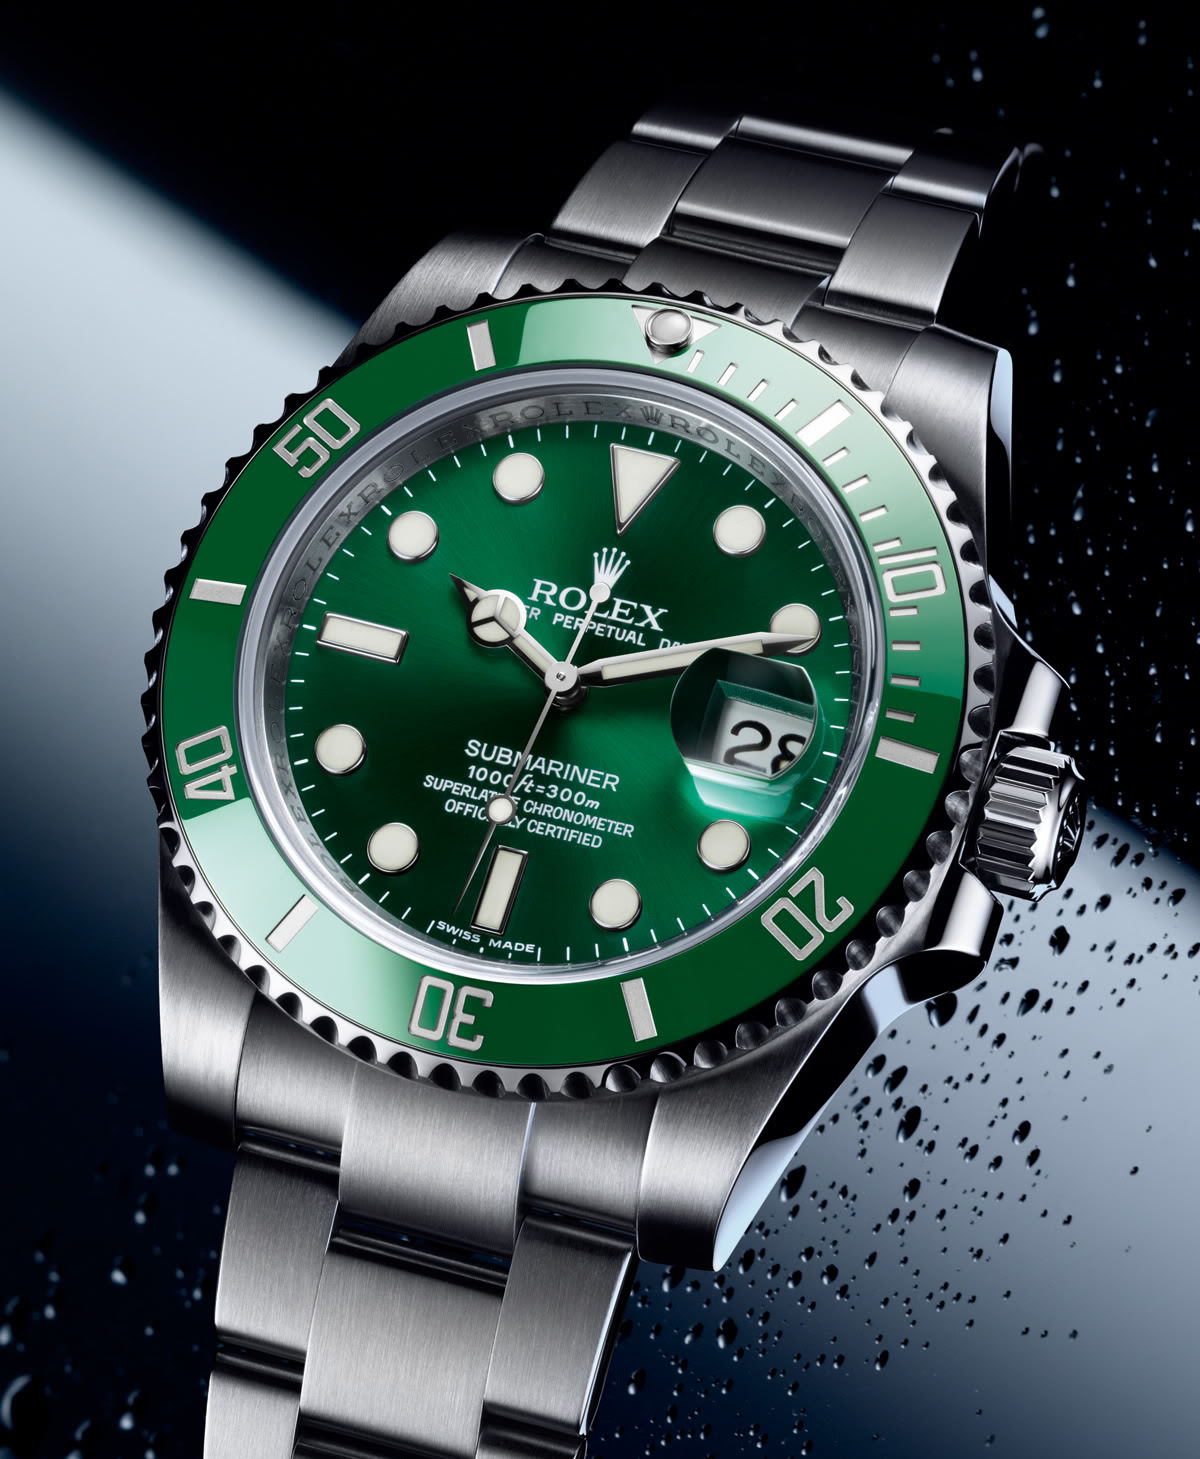 [nouveauté] Rolex submariner SUBMARINER-DATE_7